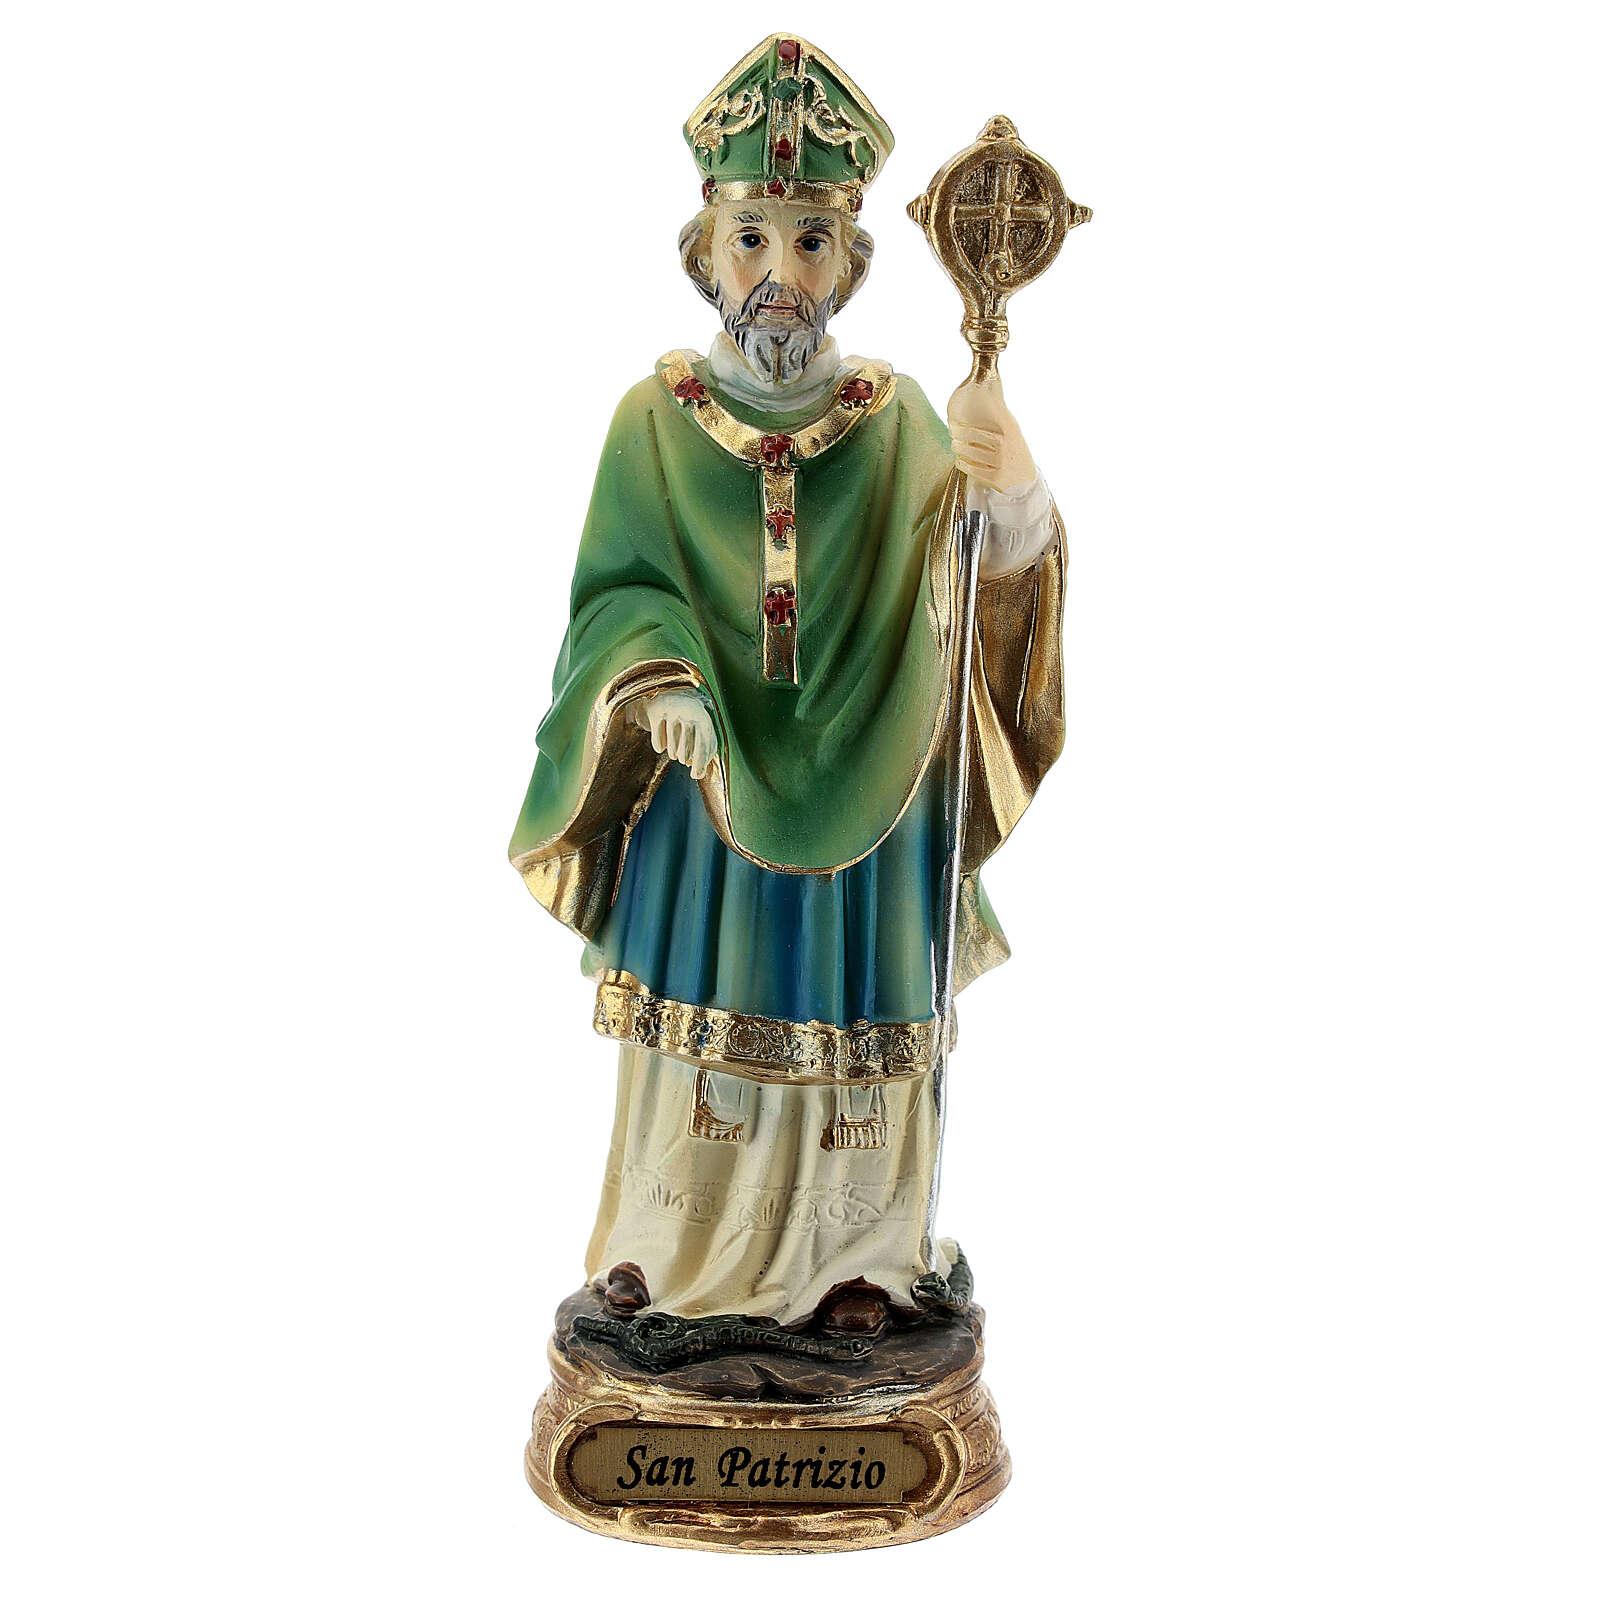 San Patrizio pastorale statua resina 13 cm 4